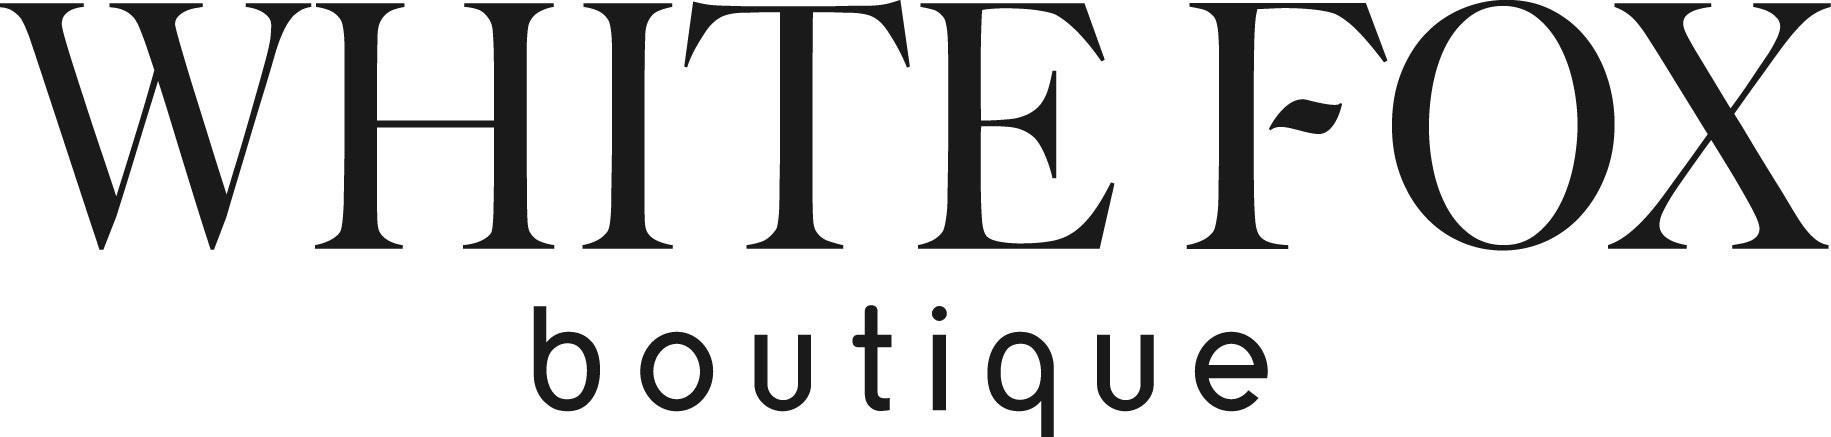 white fox boutique. Black Bedroom Furniture Sets. Home Design Ideas